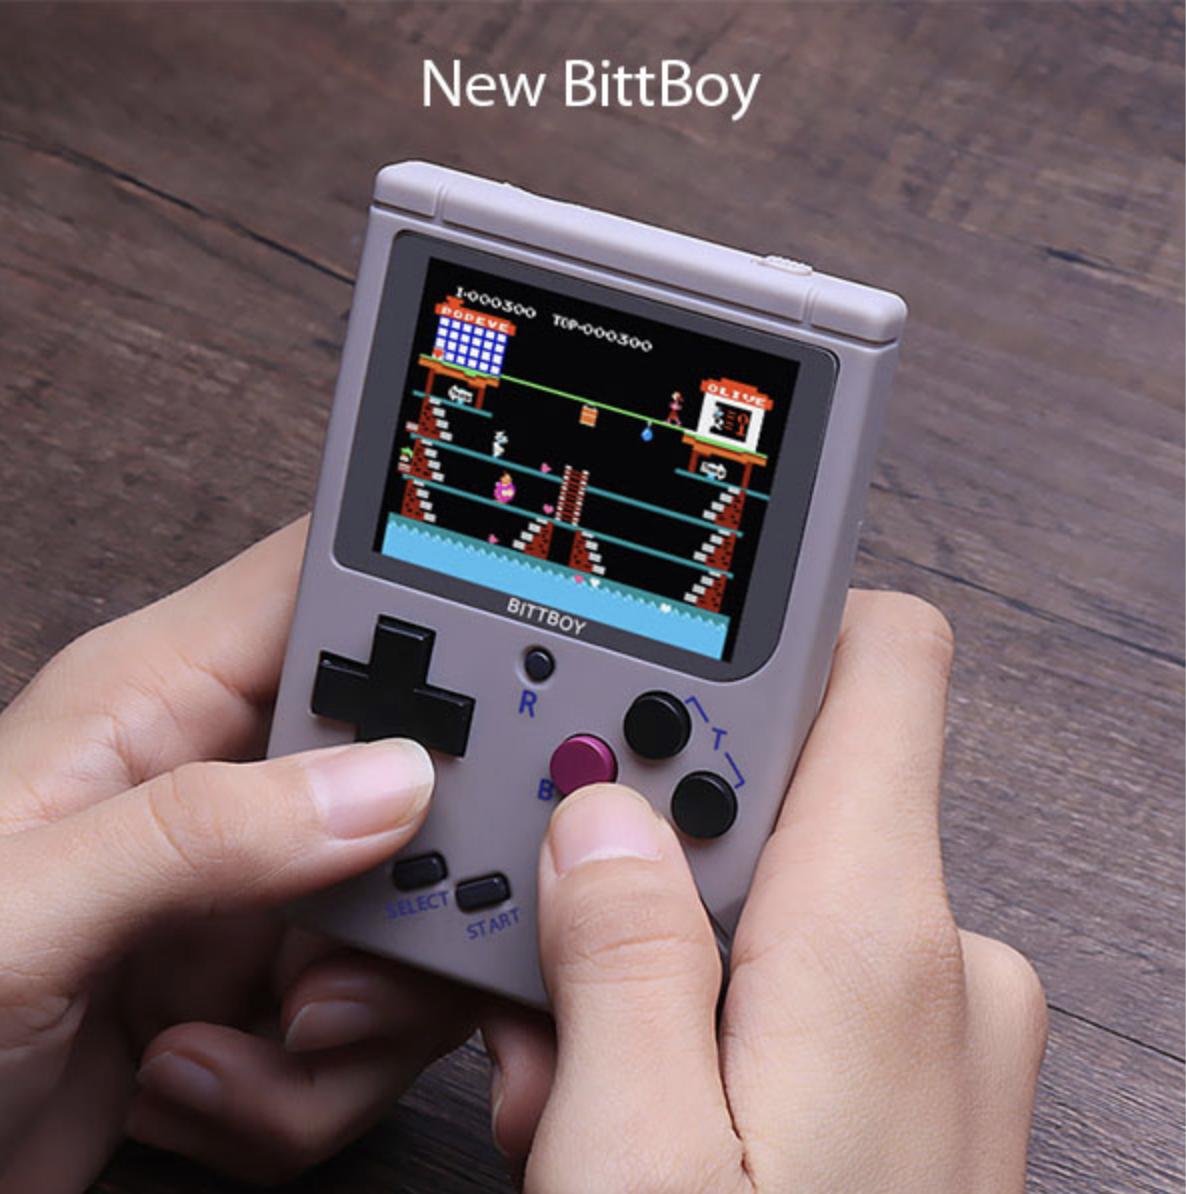 new bittboy, new bitboy, bitboy 2, bittboy 2, купить bitboy, купить bittboy, купить new bitboy, купить new bittboy, купить bitboy 2, купить bittboy 2, new bittboy украина